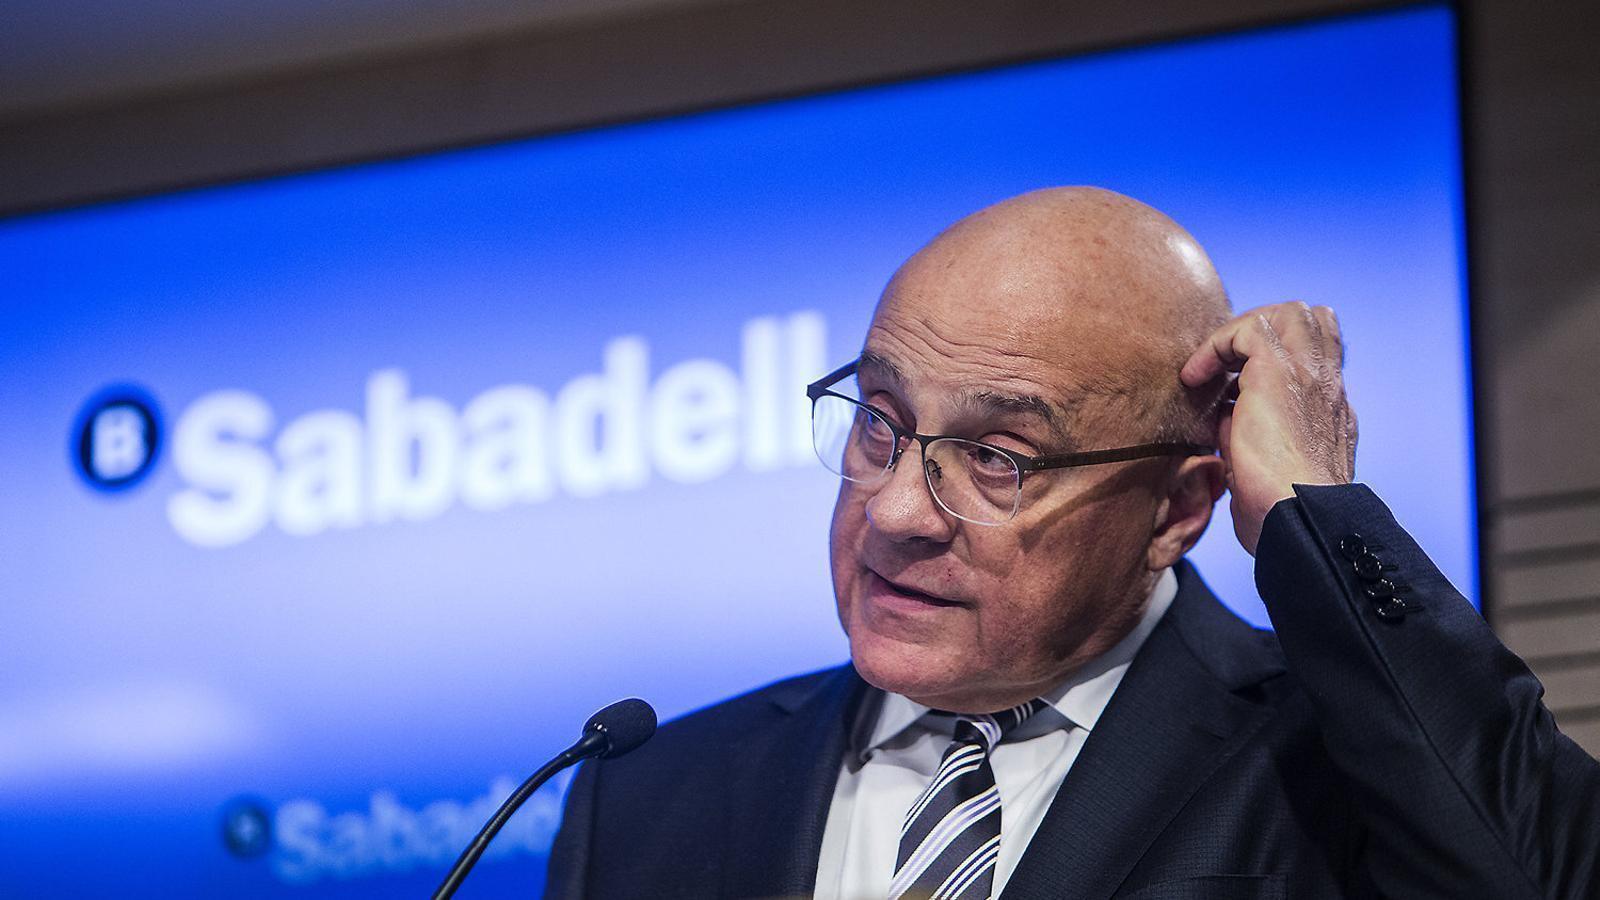 El Banc Sabadell  retallarà la plantilla  en 2.000 persones